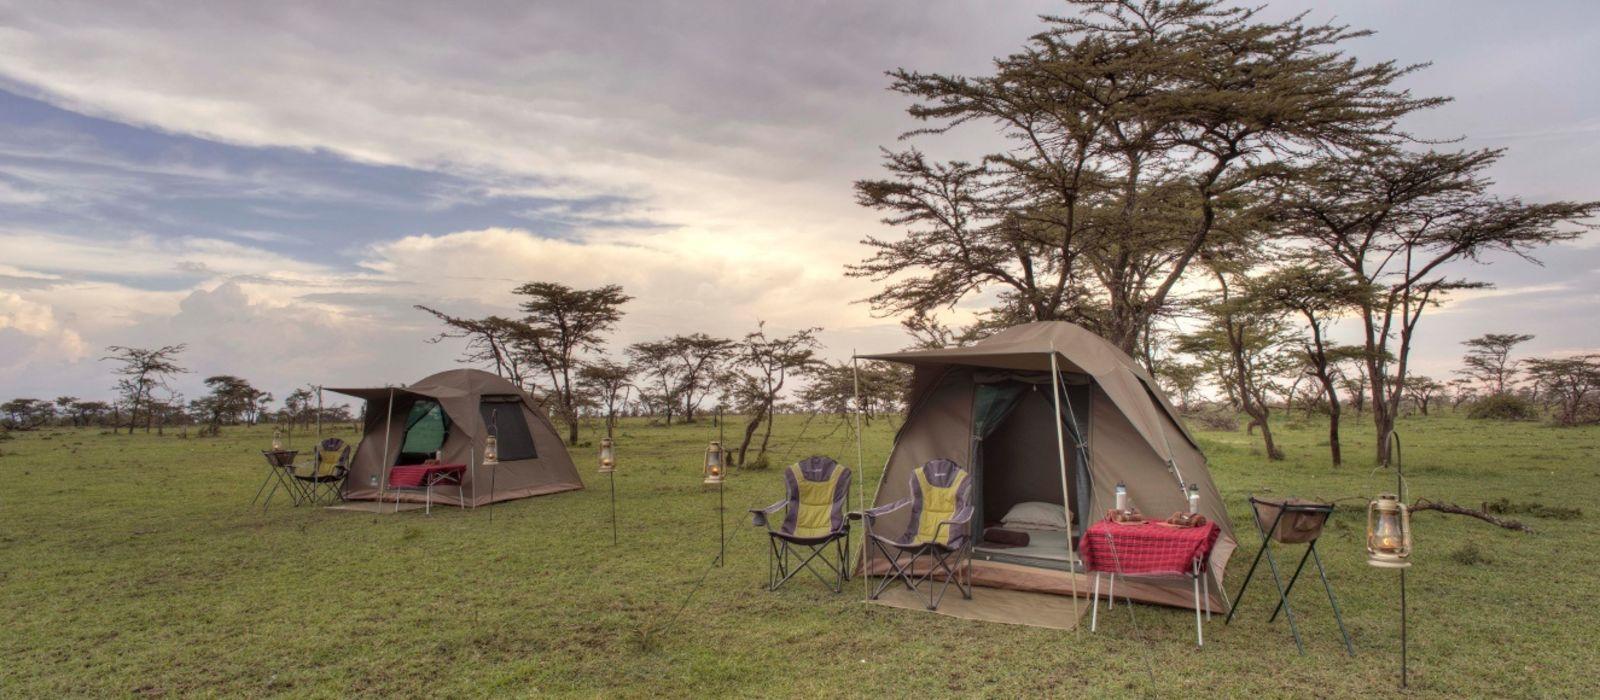 Kenia – Safari und Baden: Masai Mara & Traumstrände Urlaub 10